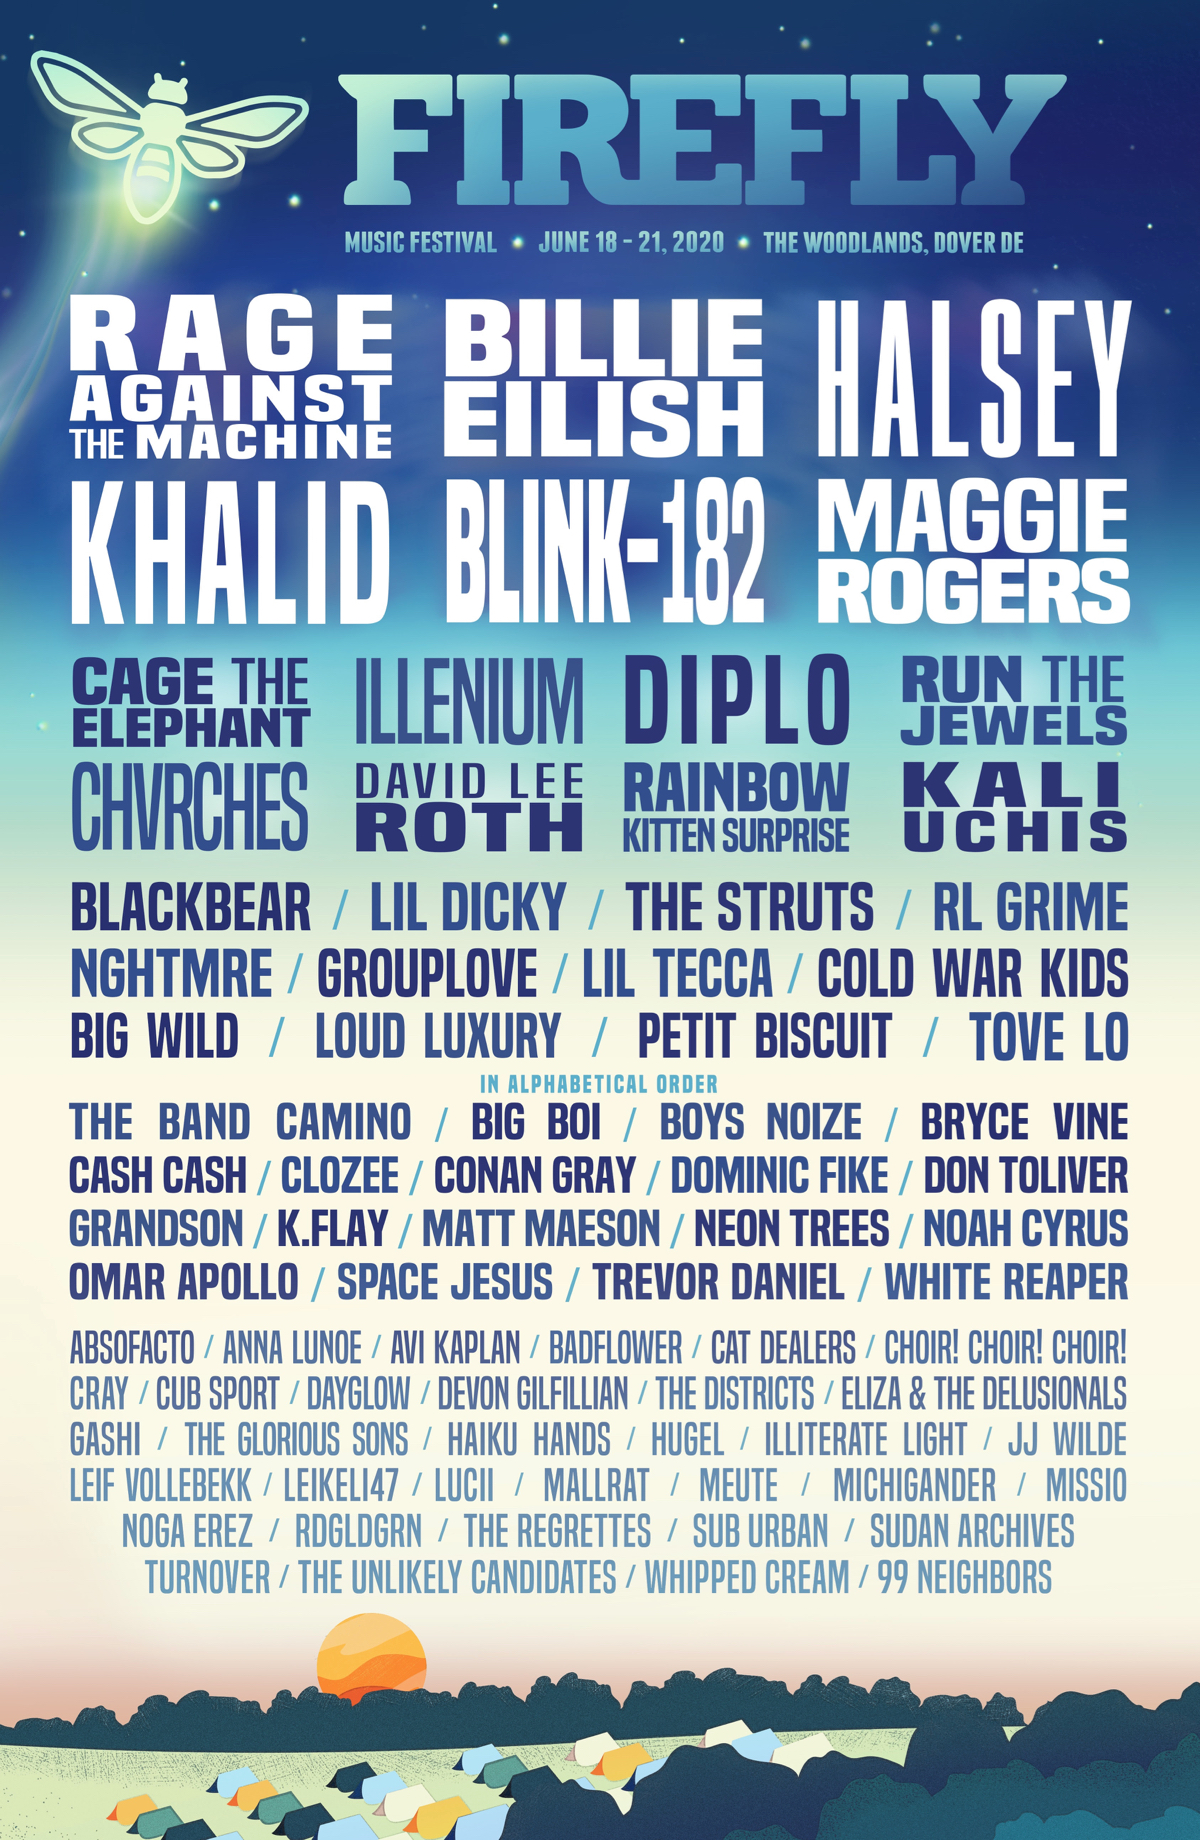 Firefly Festival 2020 lineup